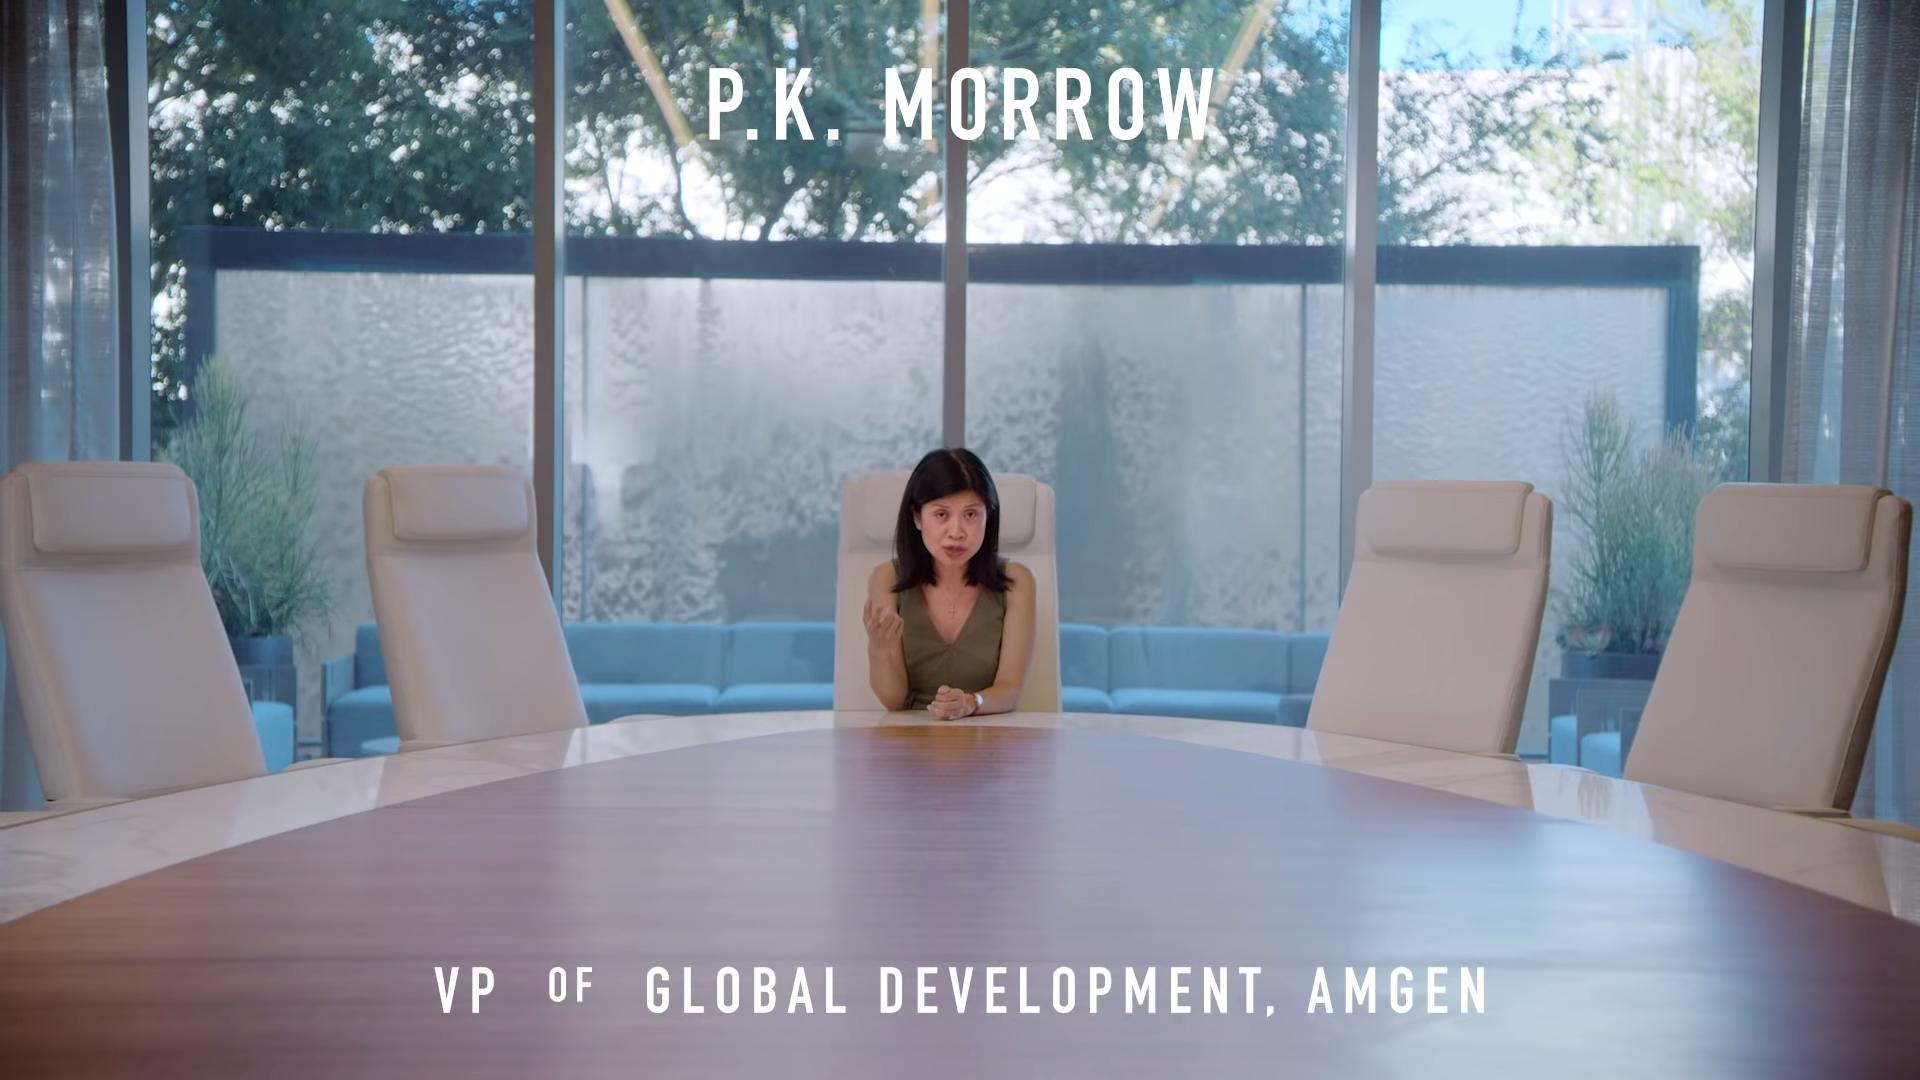 PK Morrow, VP of Global Development, Amgen.